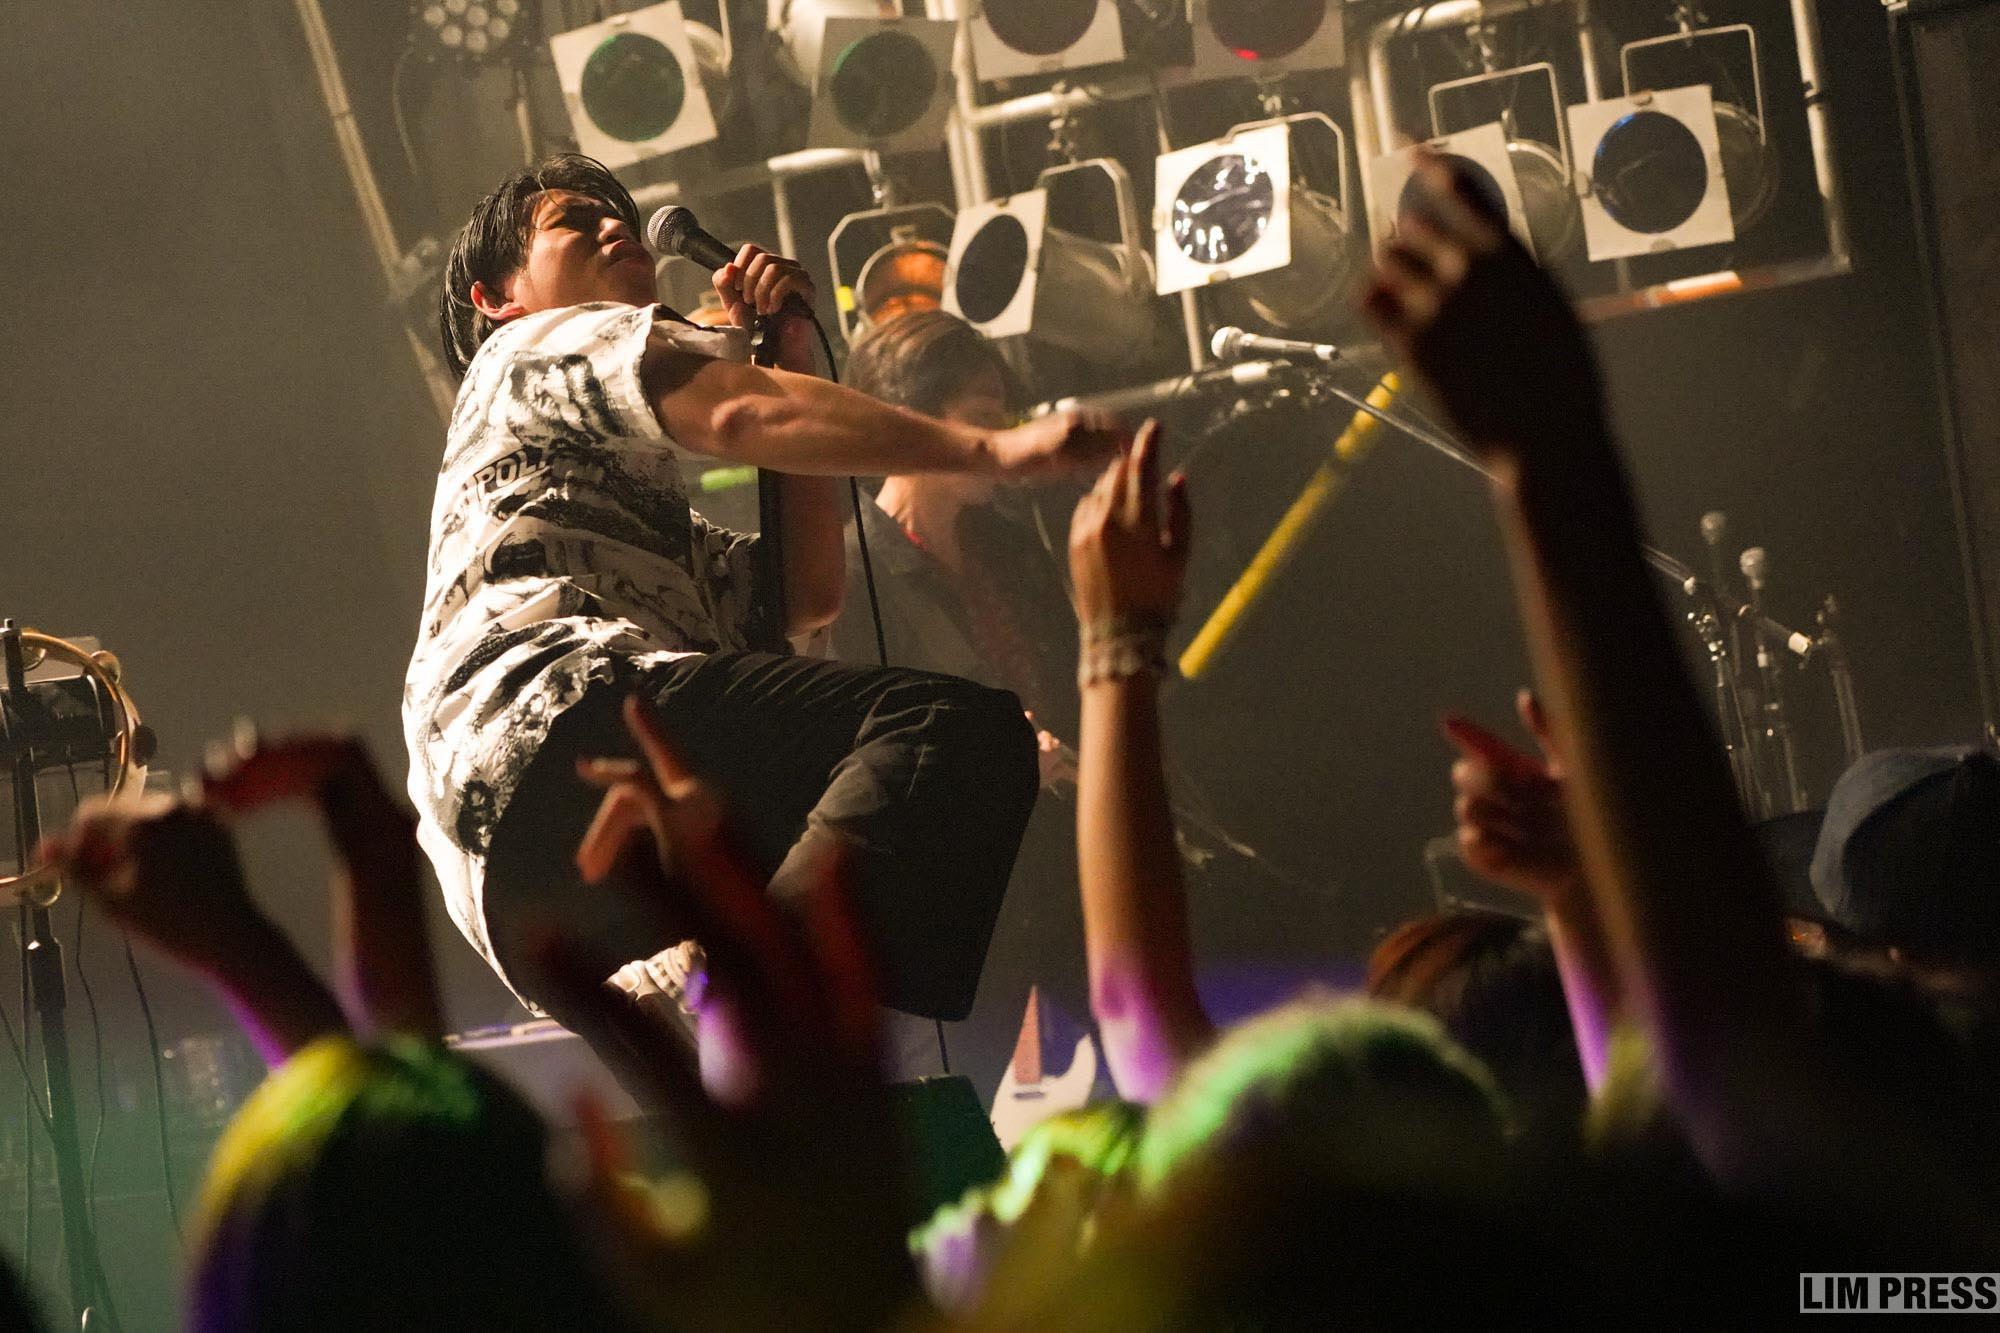 Attractions | 福岡DRUM LOGOS | 2019.10.22